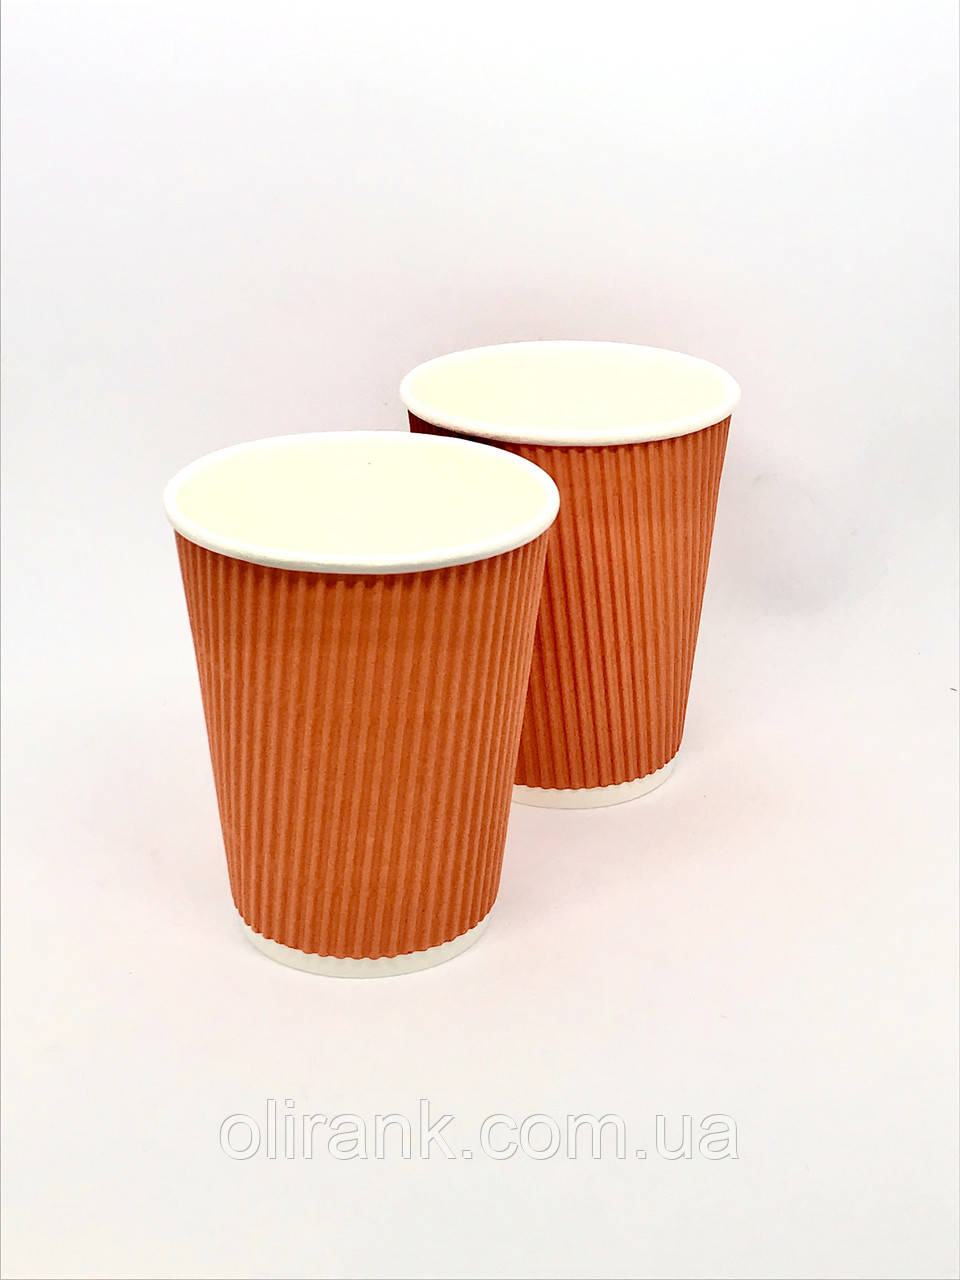 Стакан паперовий RIPPLE  185 мл помаранчевий 25шт/уп (36уп/ящ)  (кр -69 )